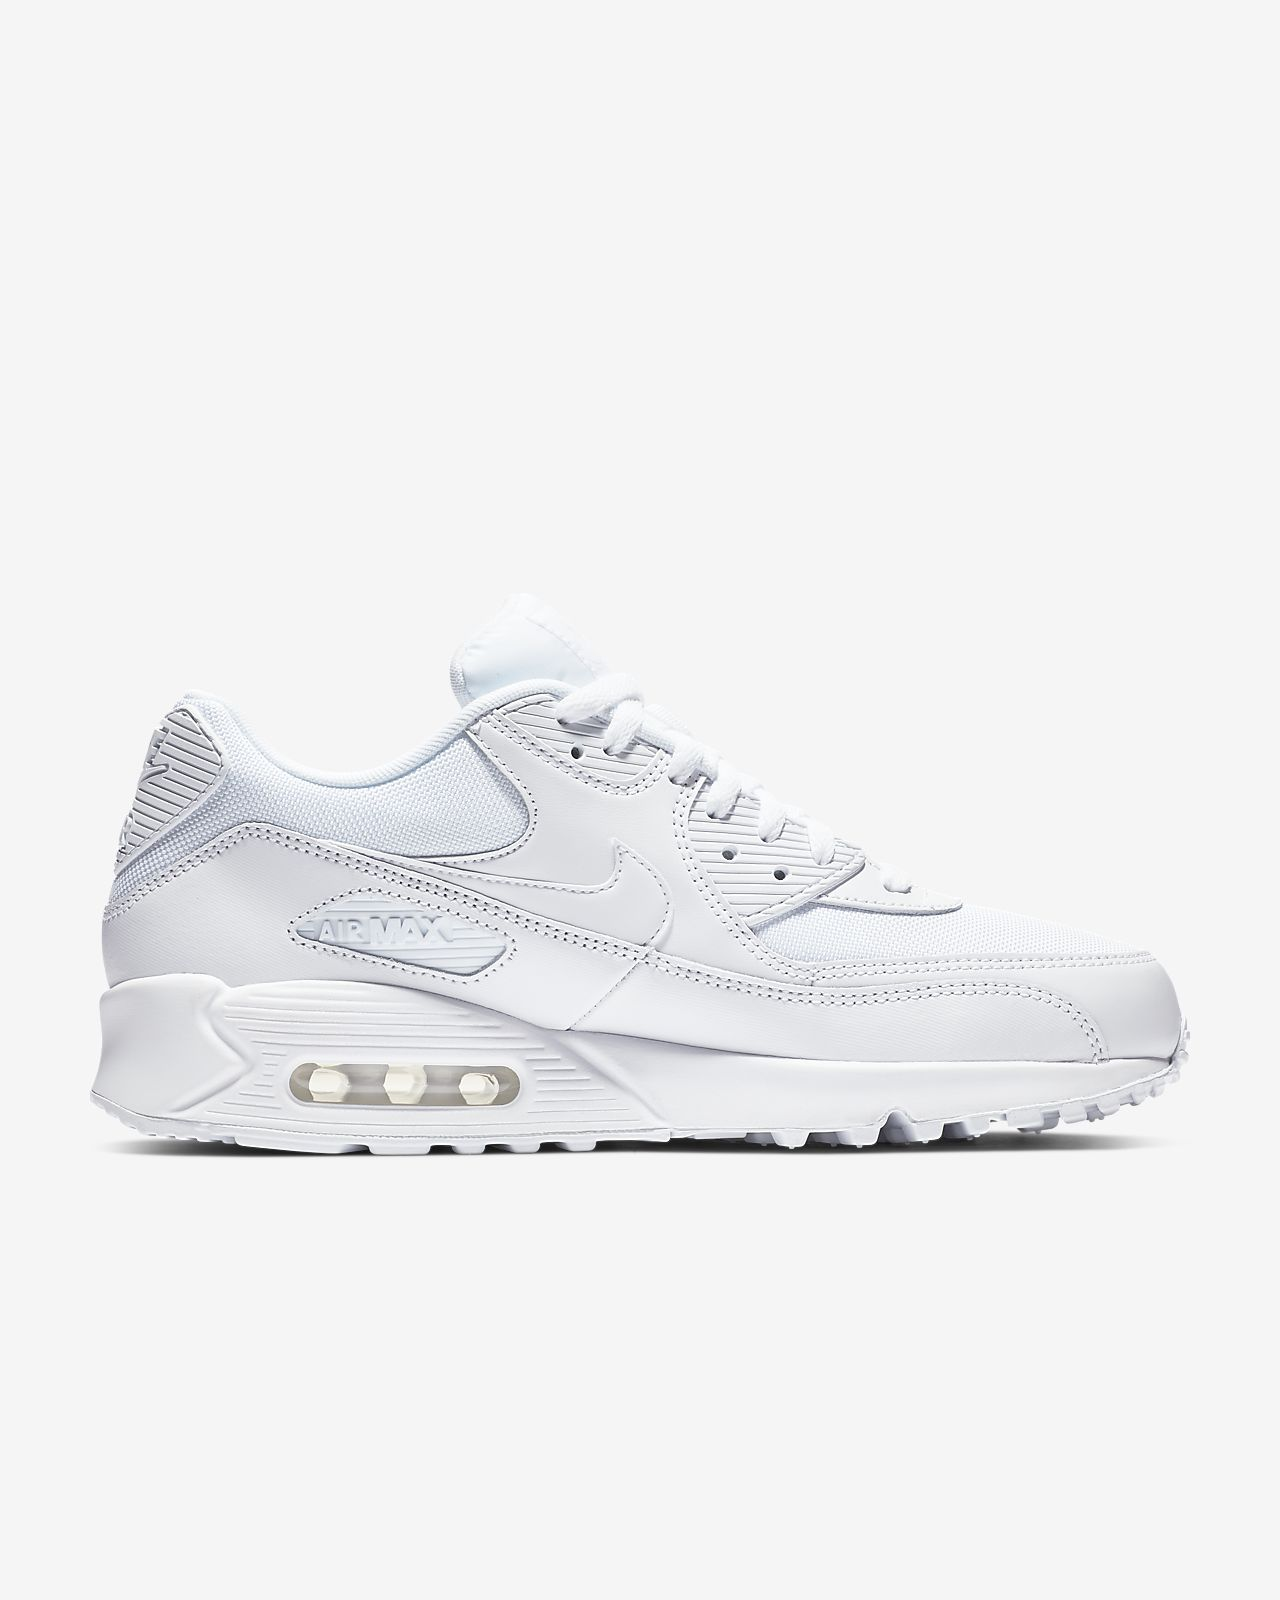 nike store official site,nike air max 10,Nike Air Max 90